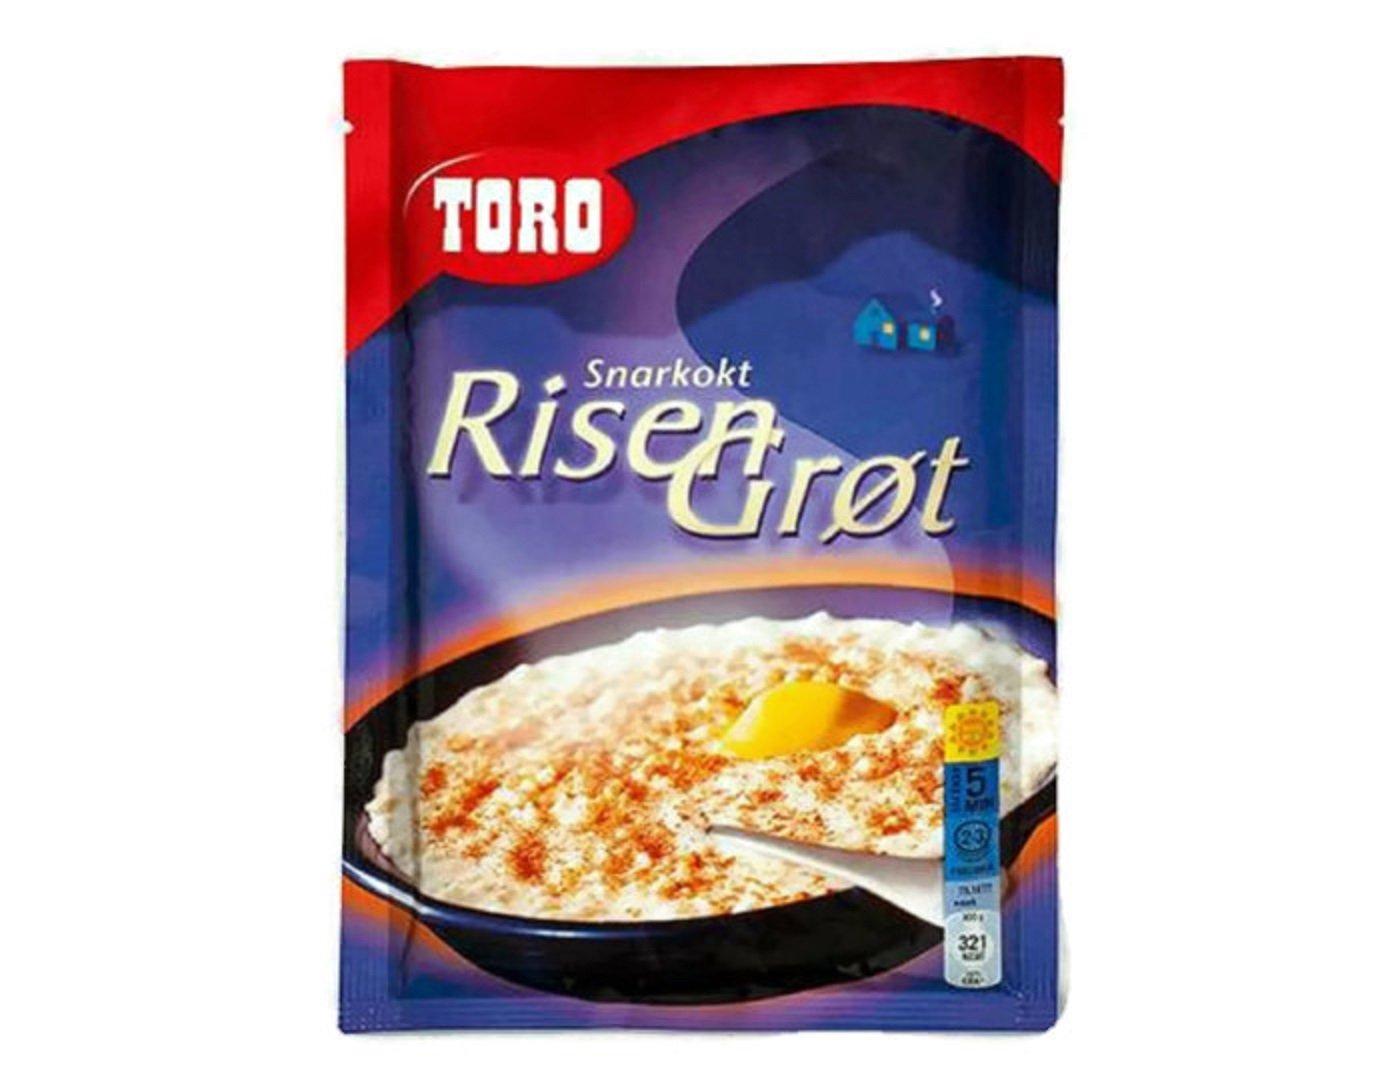 Toro Instant Rice Porridge Mix - 2 Packs (Snarkokt Risen Grot) - Imported Norwegian Food 4 to 6 Servings